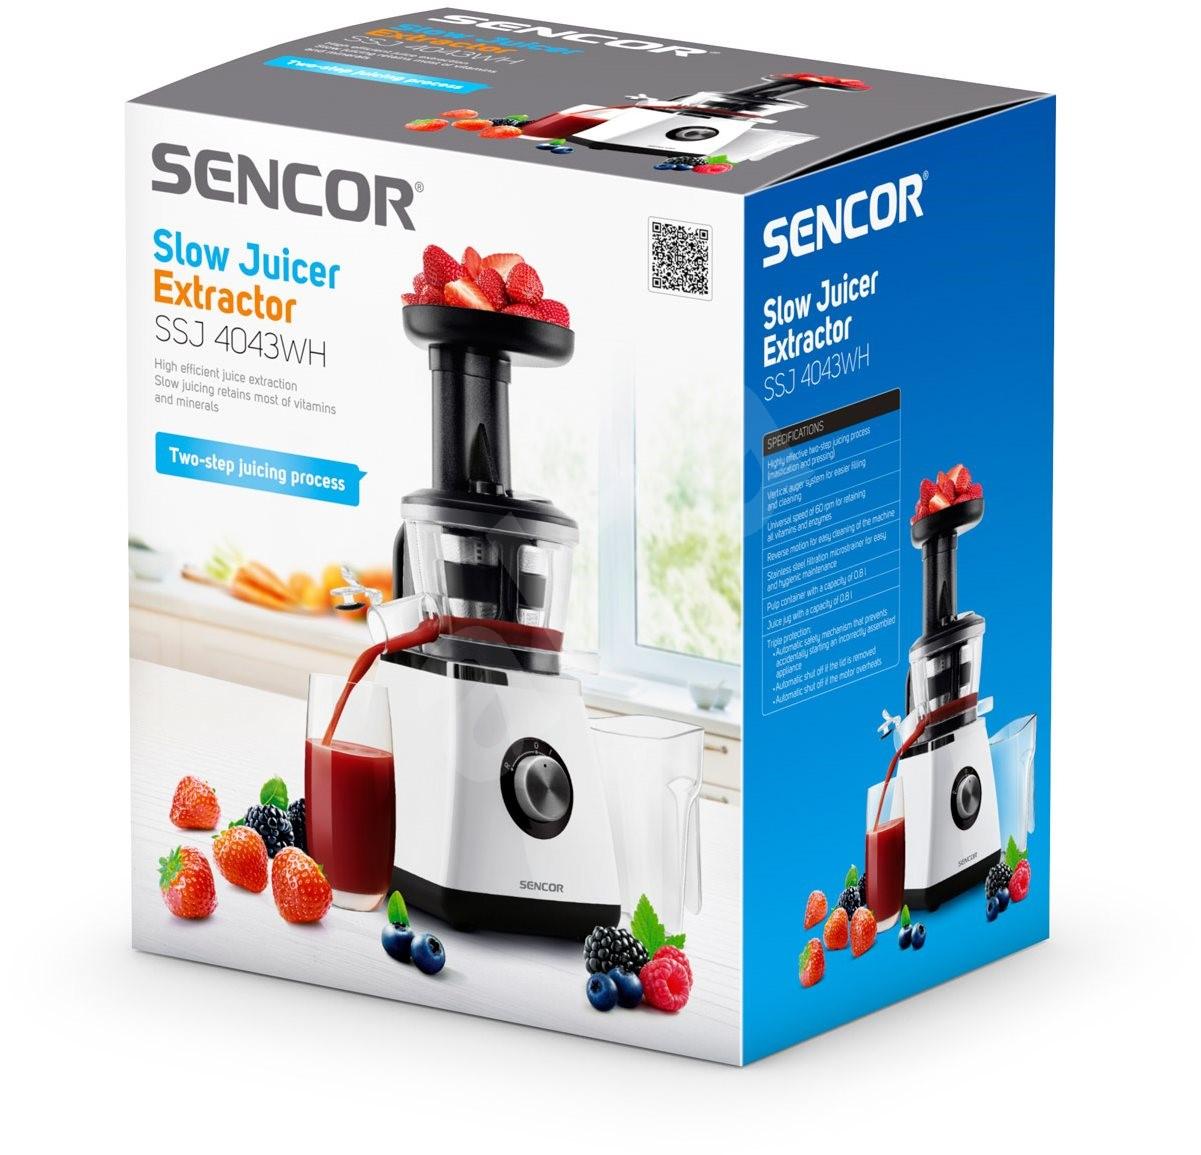 Slow Juicer Extractor Ssj 4043wh : Sencor SSJ 4043WH - Juicer Alzashop.com